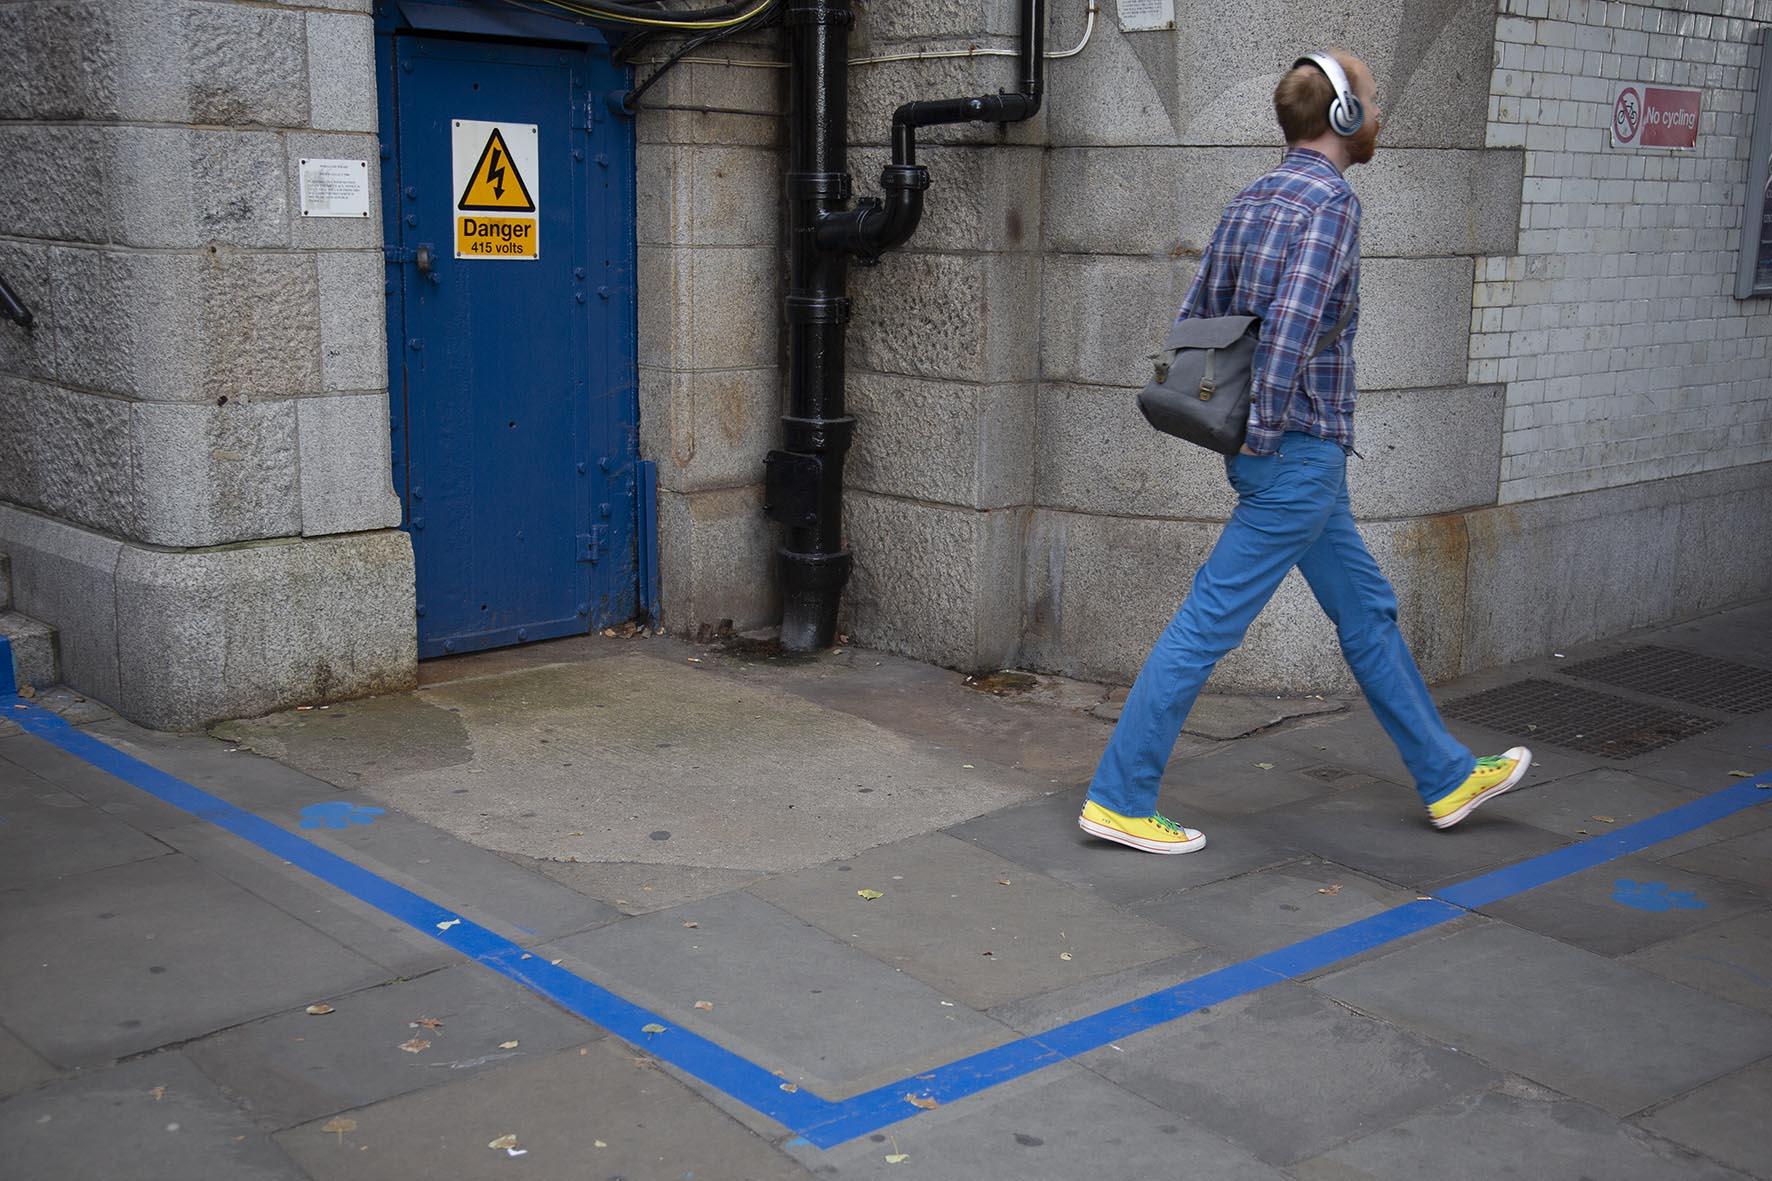 20141003_blue line trousers_A.jpg